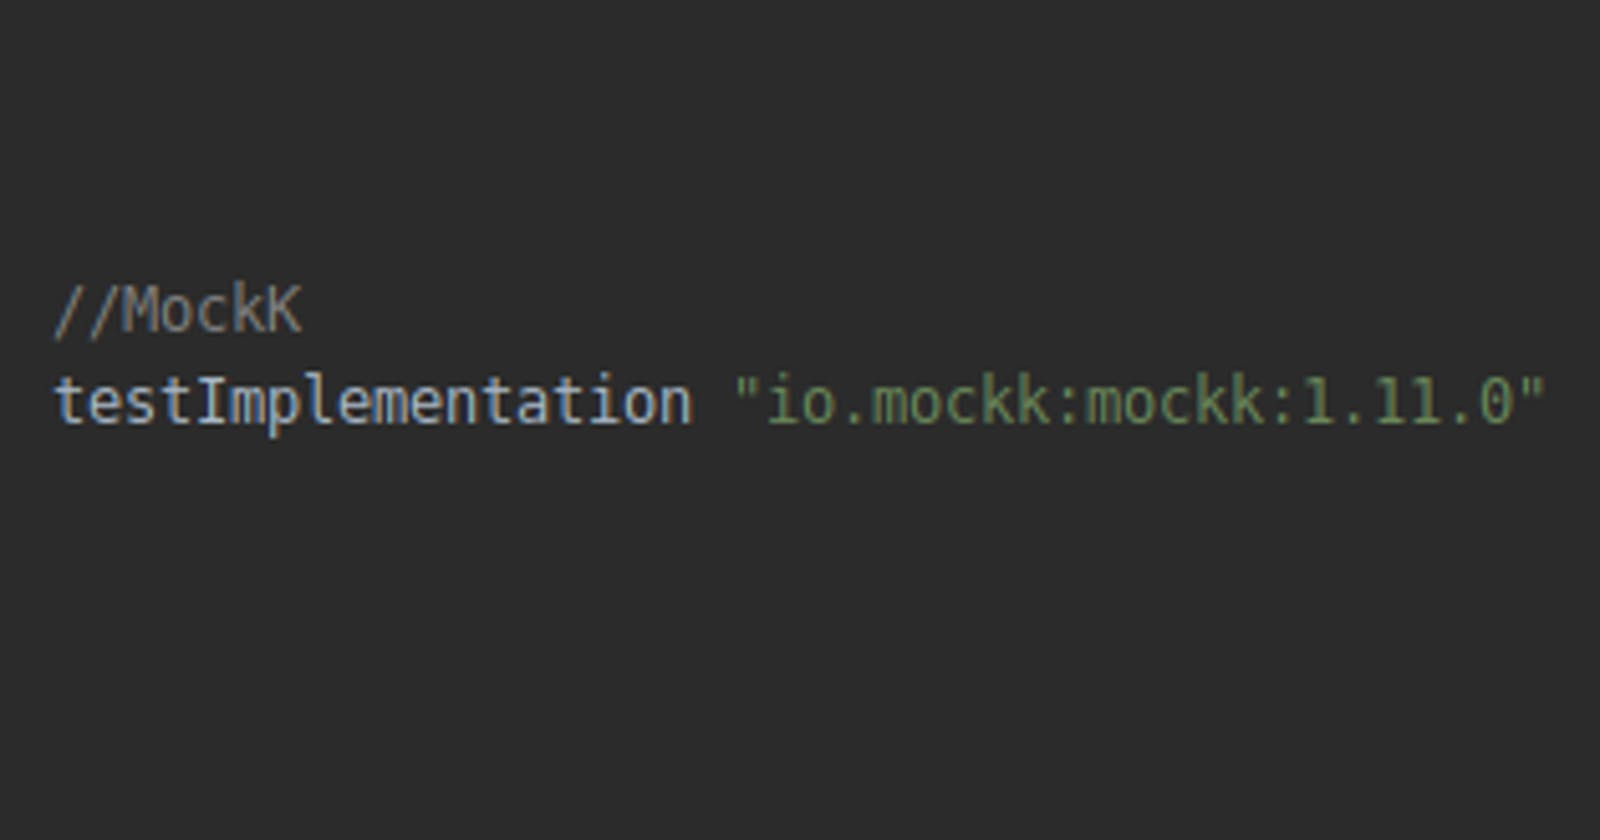 Testing With MockK